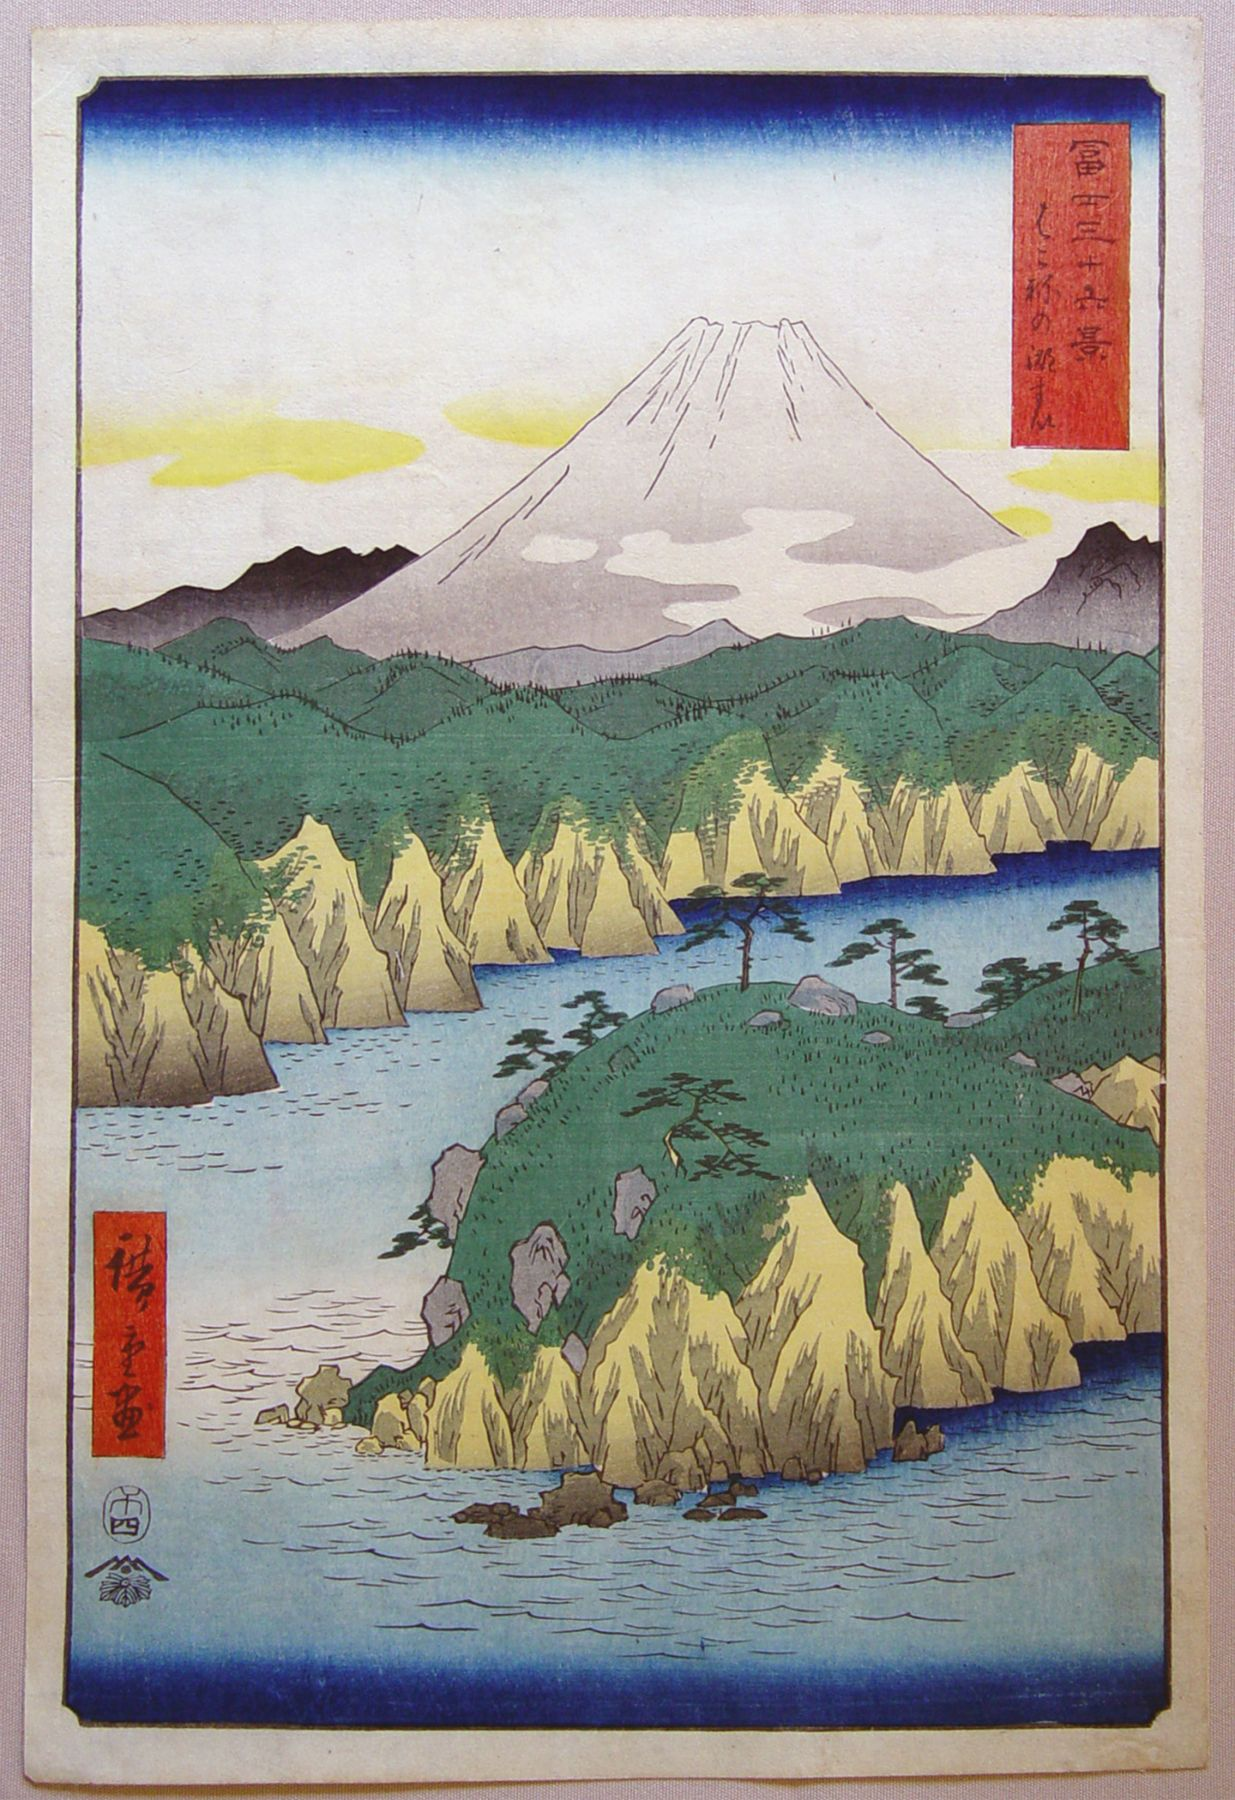 Utagawa Hiroshige (1797-1858), Lake at Hakone from the series Thirty-six Views of Mt. Fuji